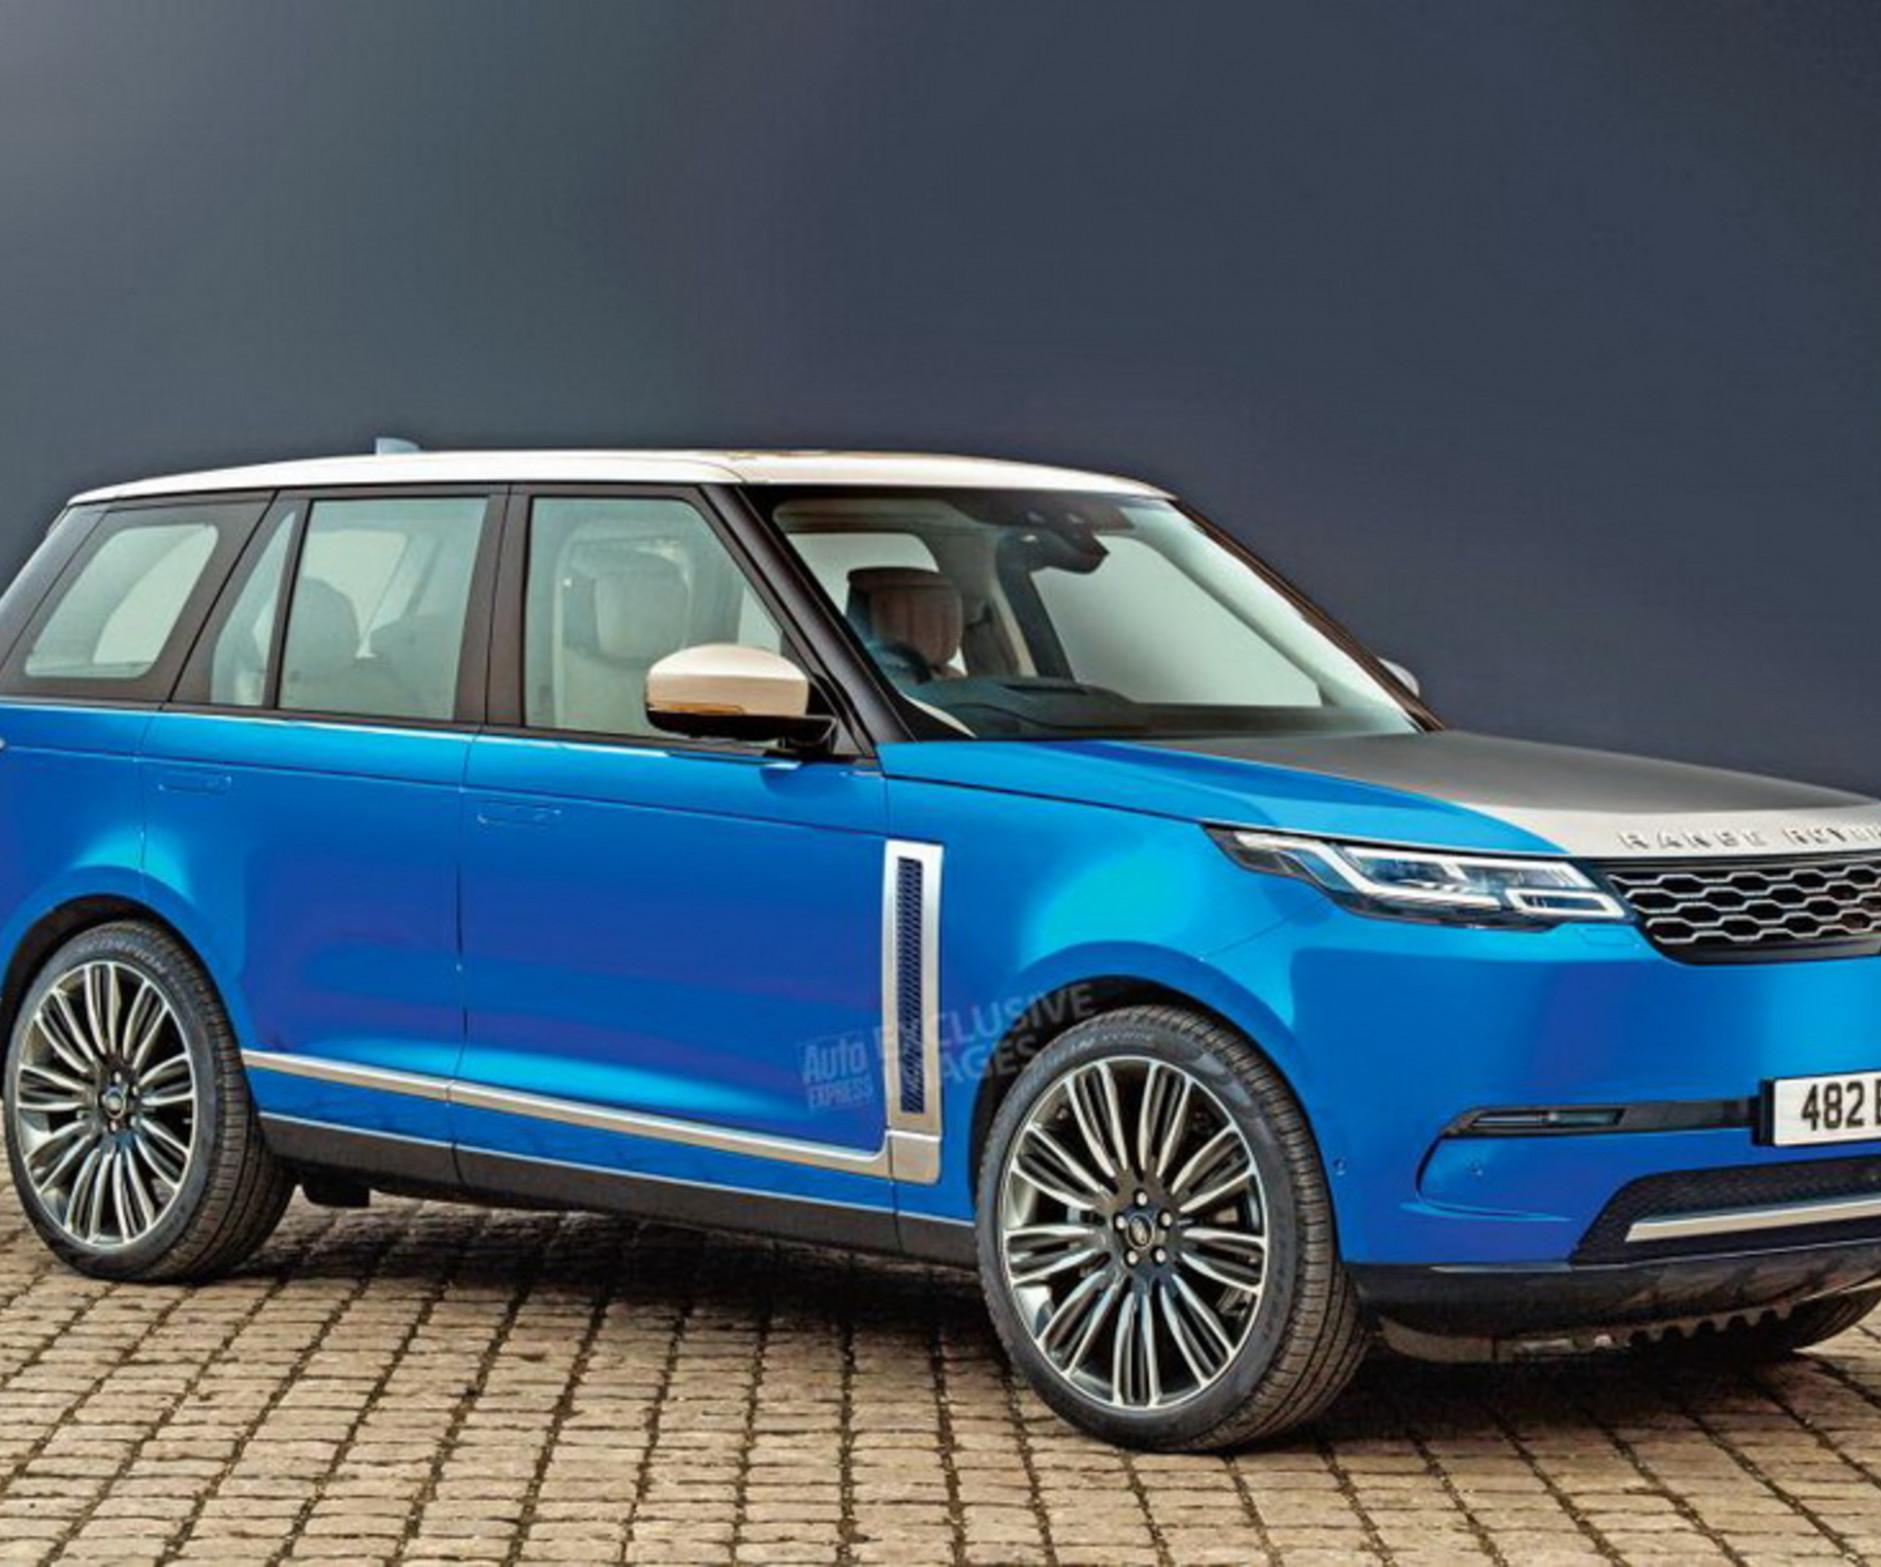 Picture 2022 Range Rover Sport